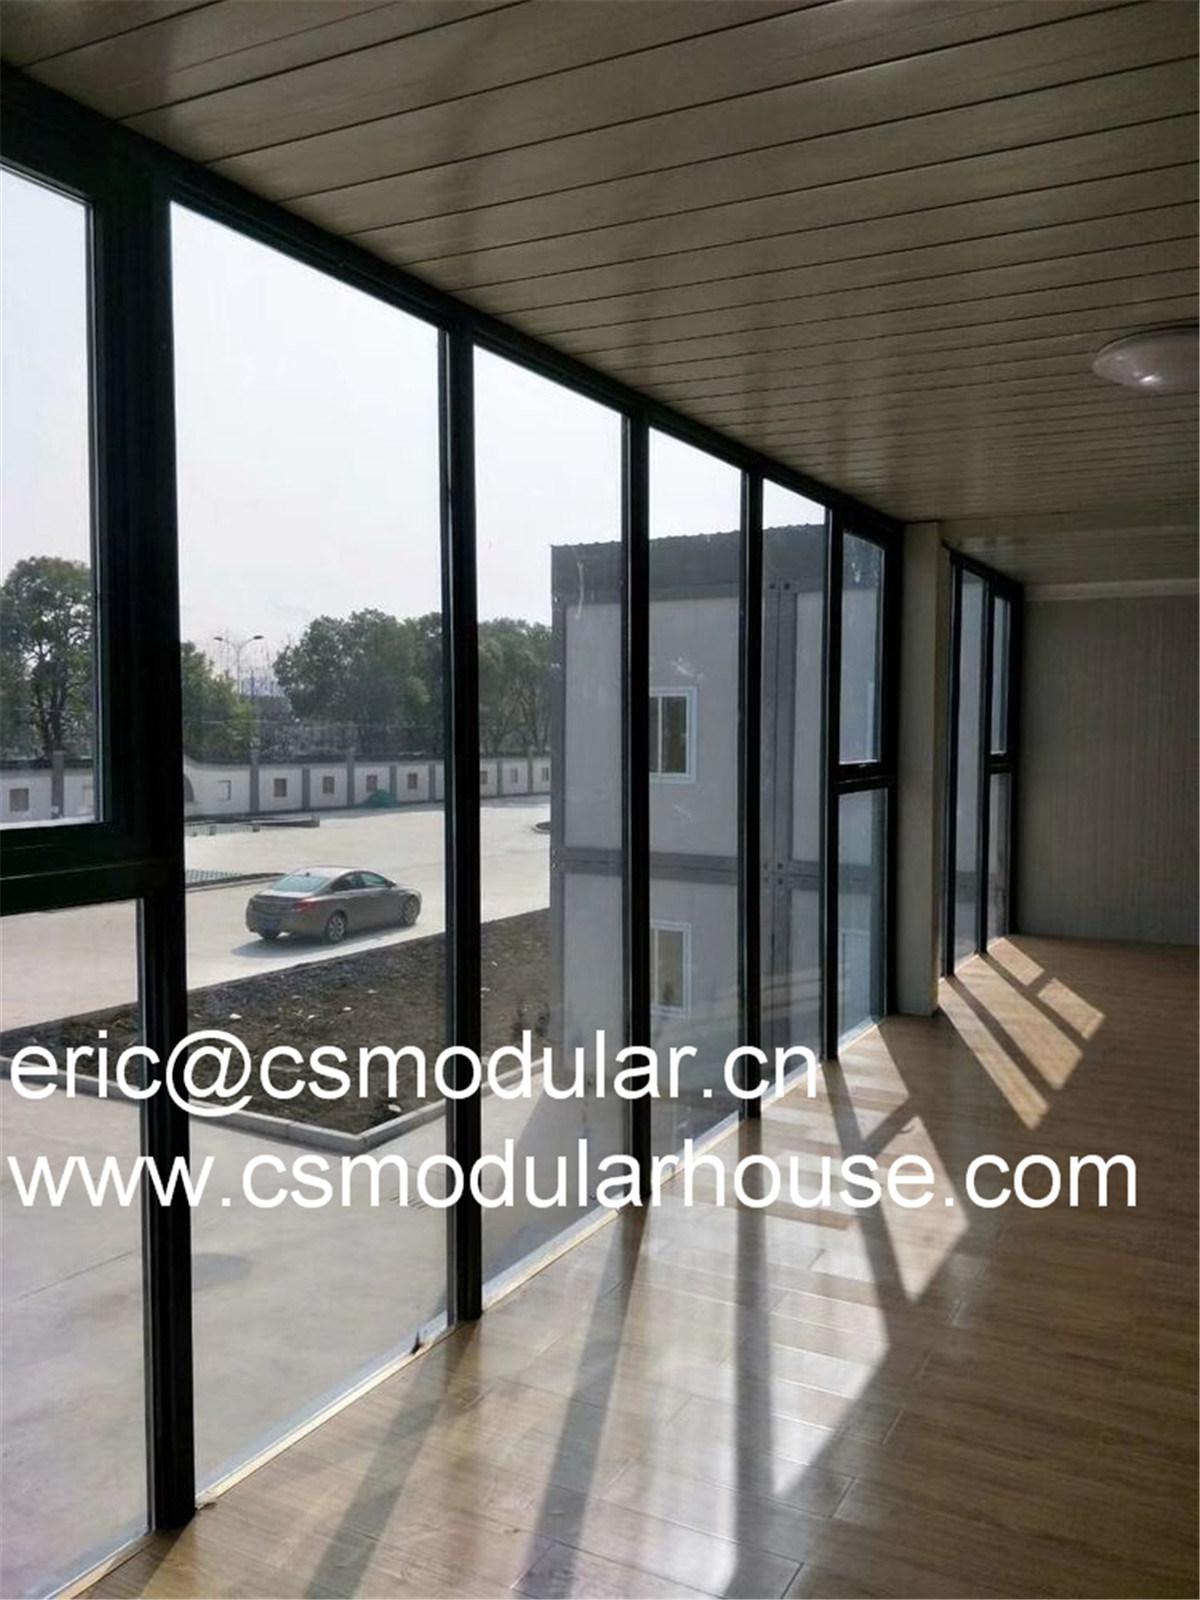 Jiangsu CS Modular House Co., Ltd.